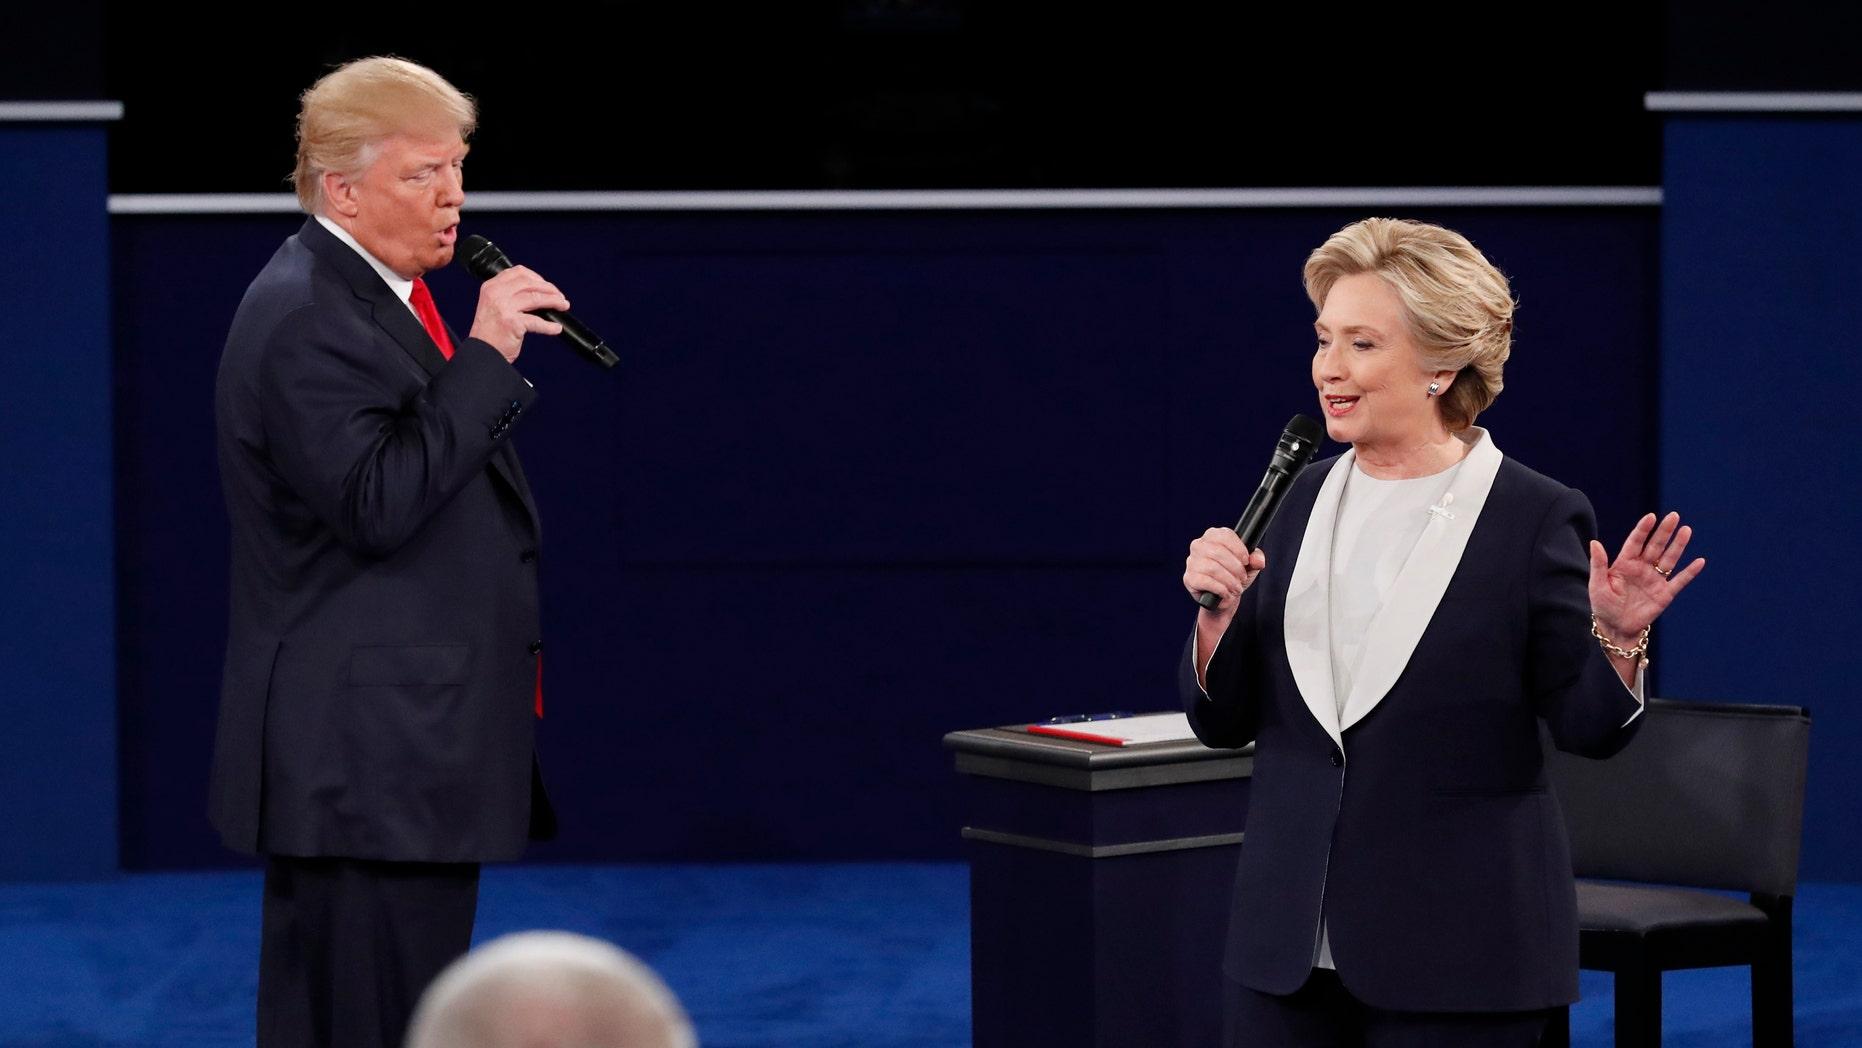 October 9, 2016: Republican presidential nominee Donald Trump and Democratic presidential nominee Hillary Clinton speak during their presidential town hall debate at Washington University in St. Louis, Missouri.